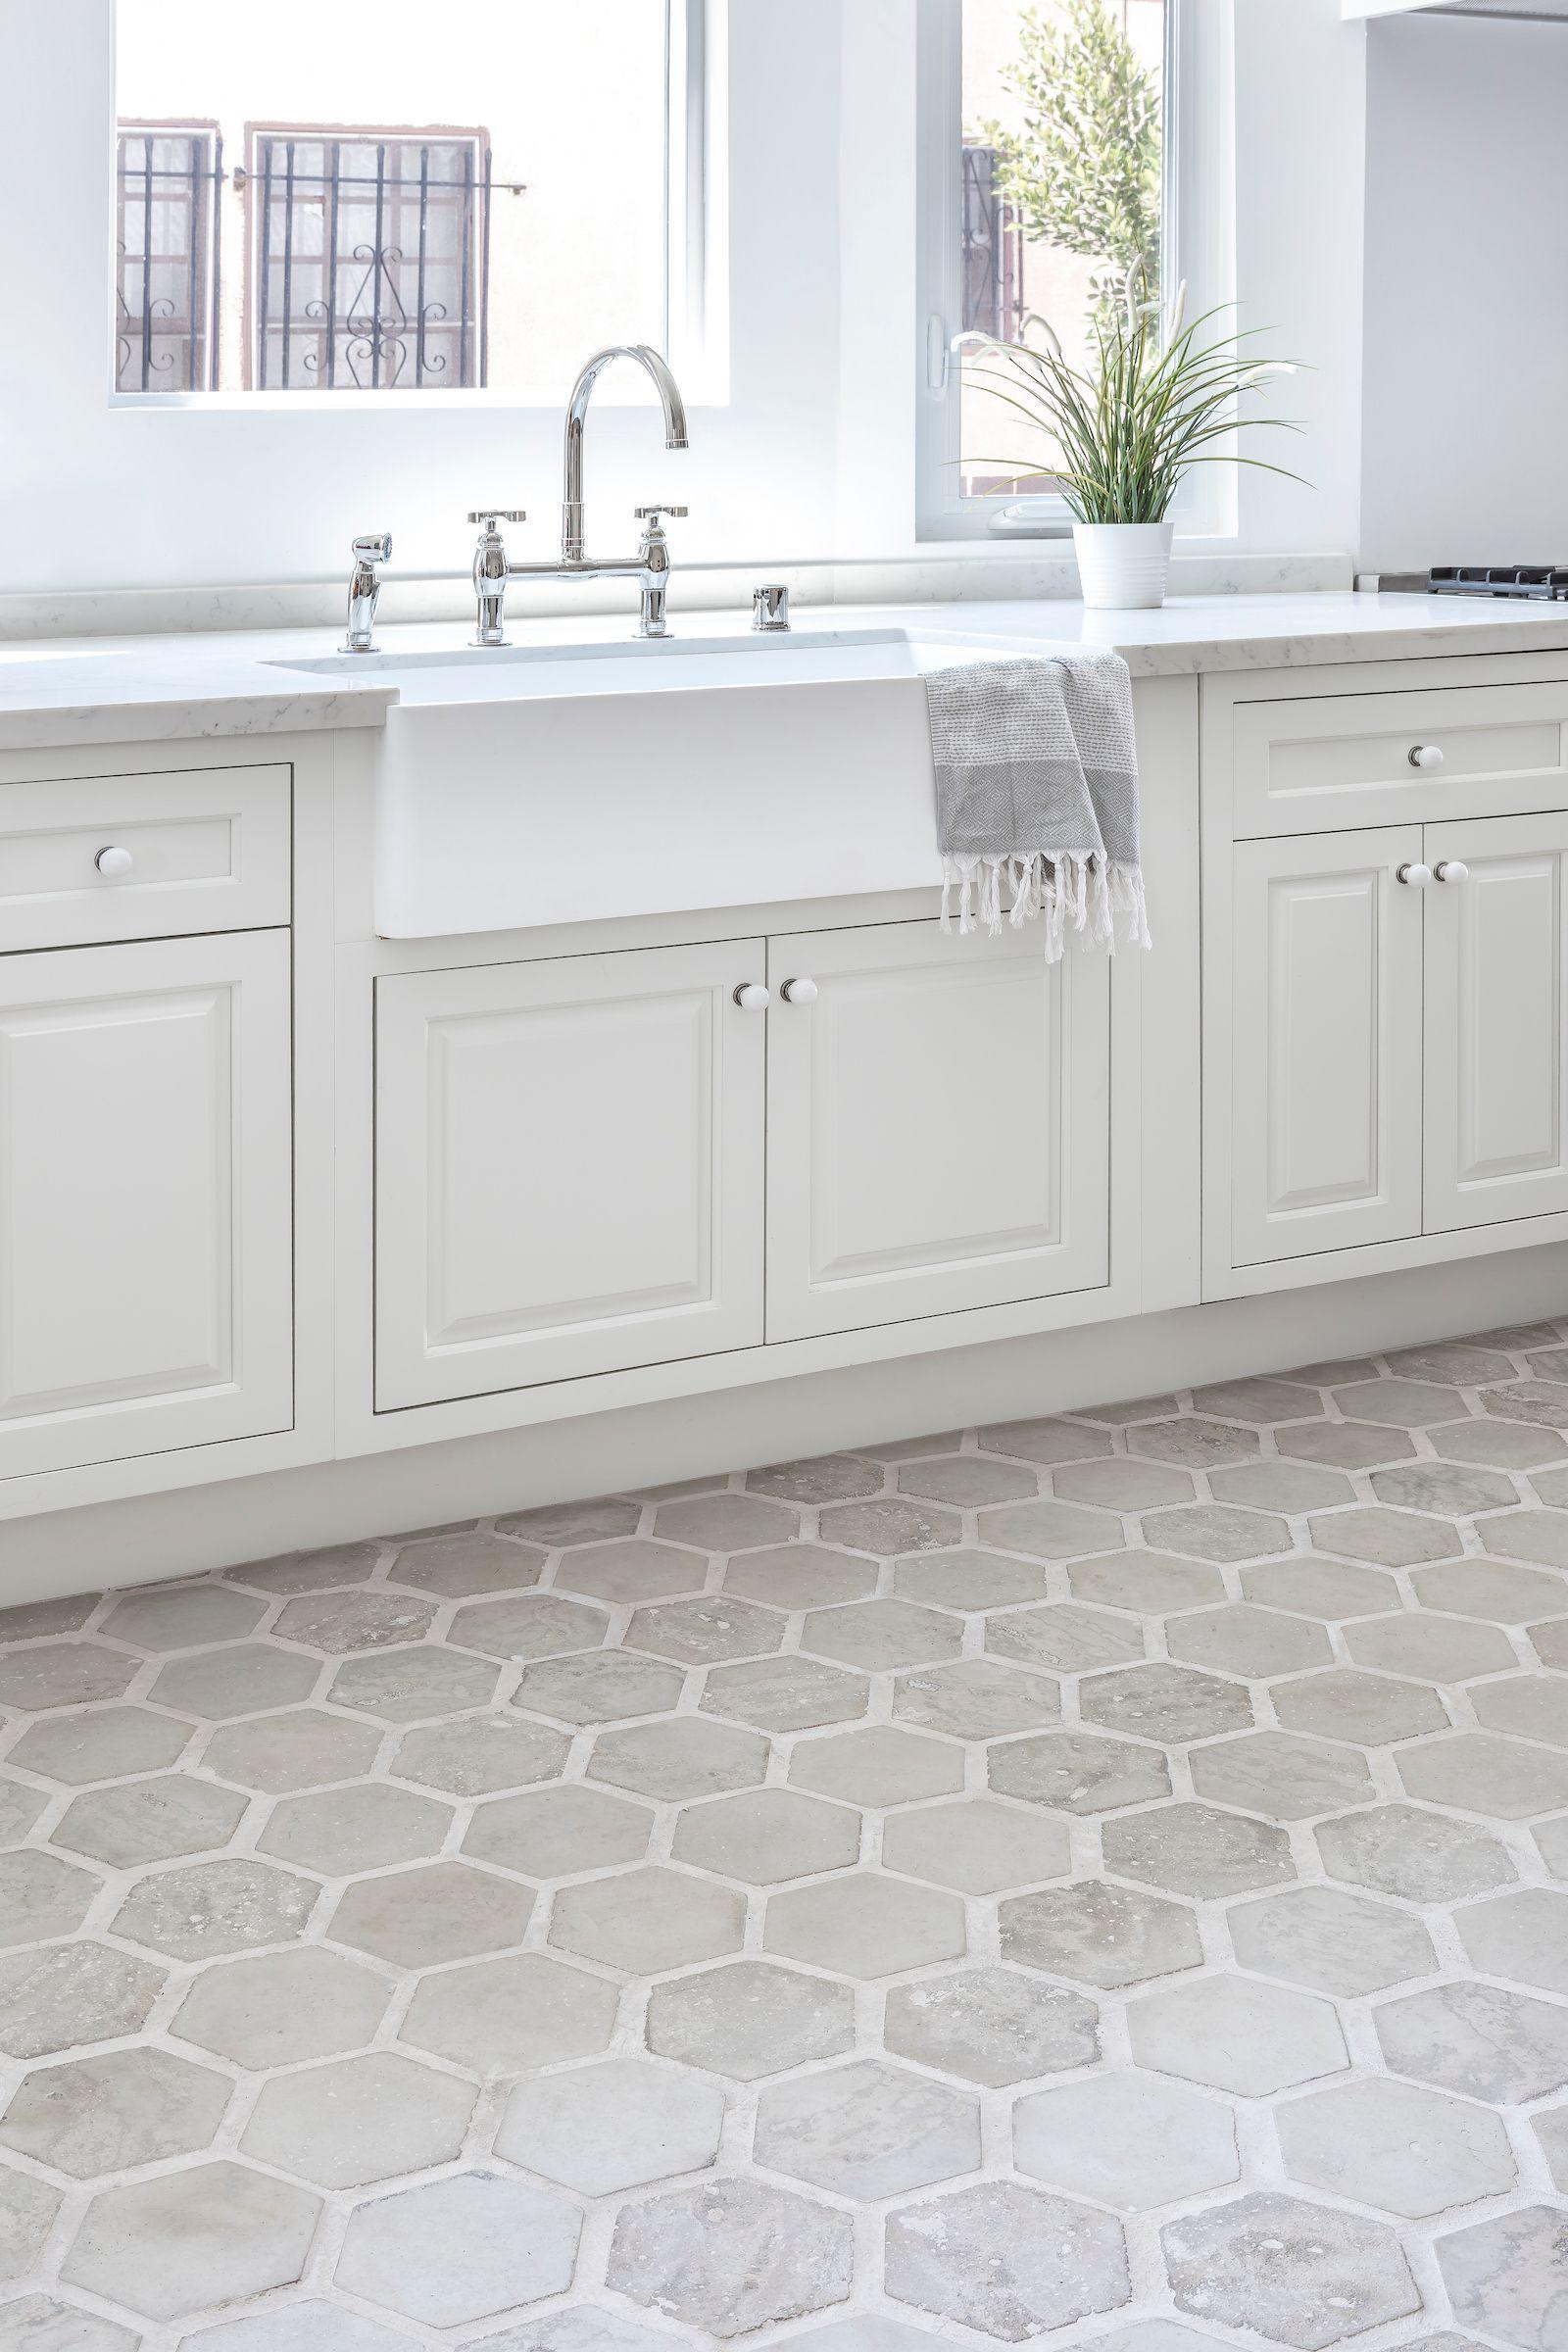 Tile Floor In 2020 Grey Kitchen Tiles Grey Tile Kitchen Floor Neutral Kitchen